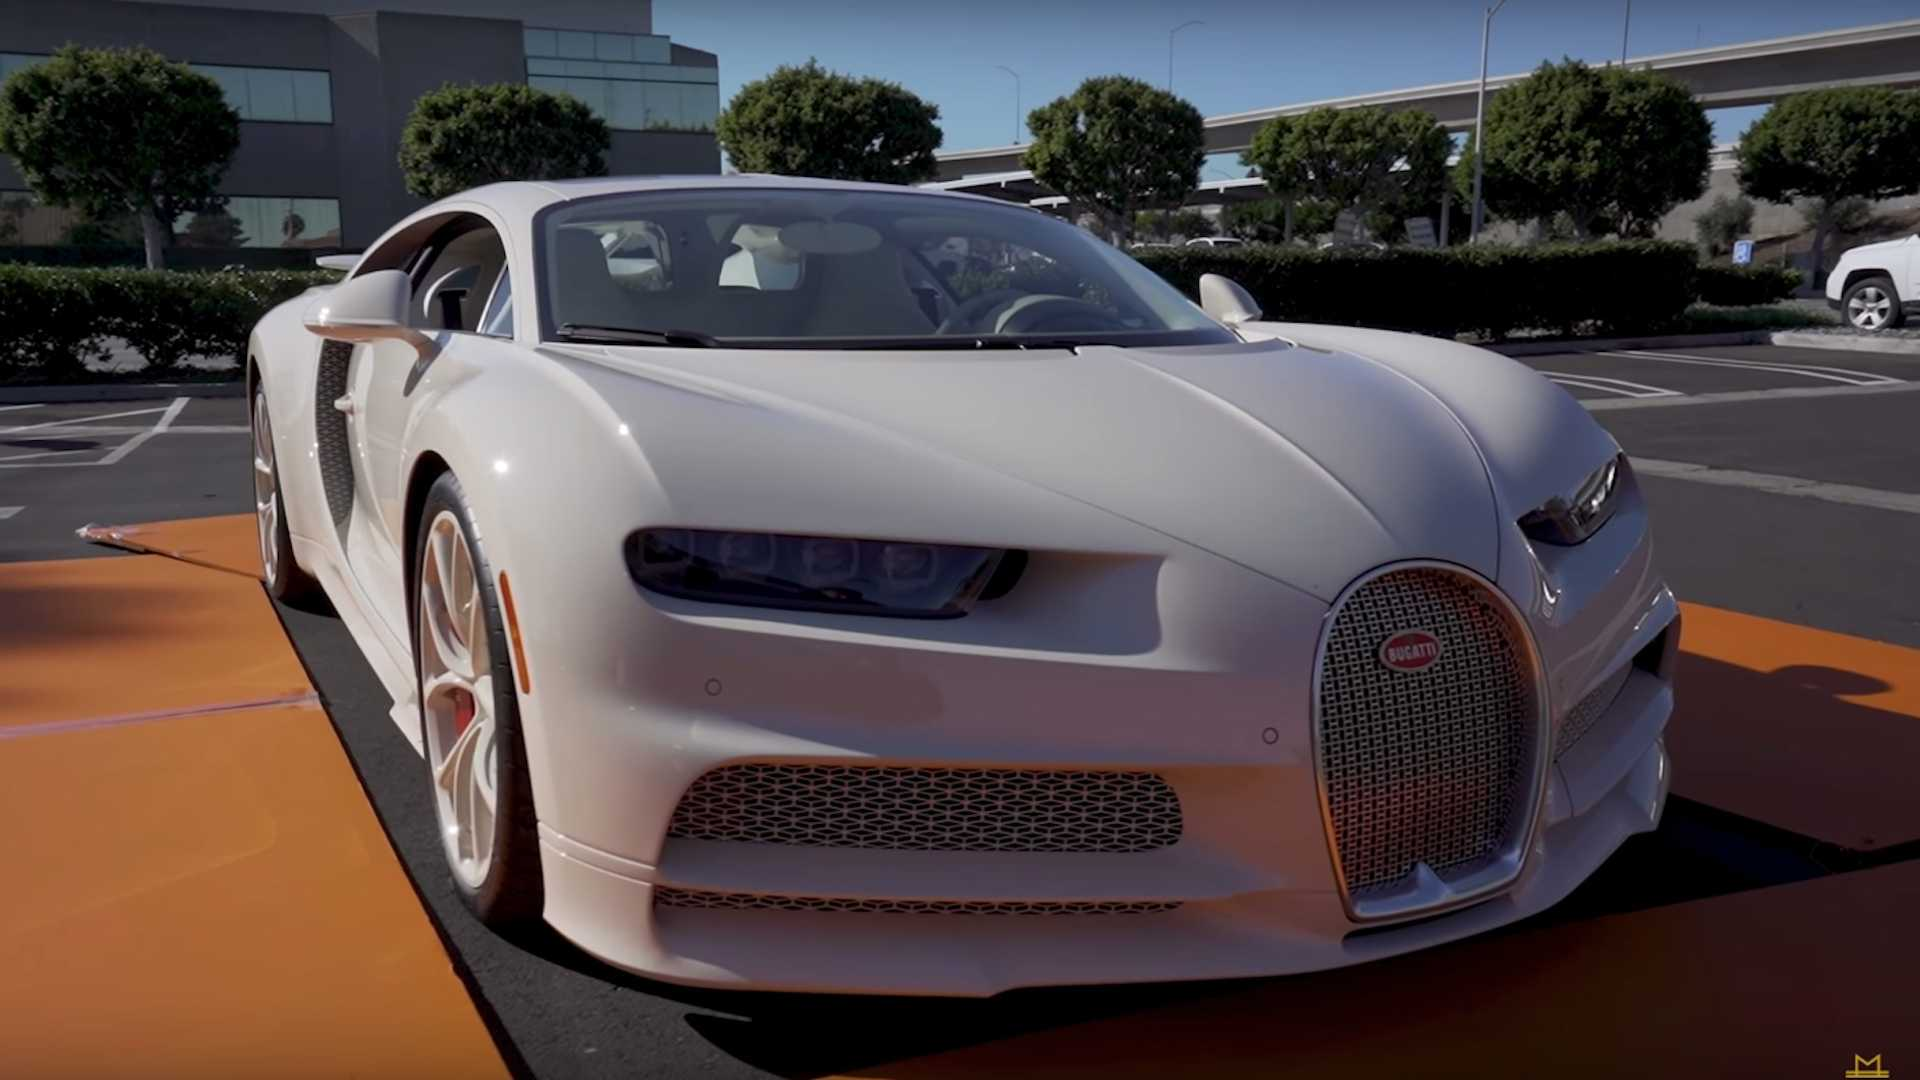 Bugatti Chiron Owner Shows Off His Unique Hermes Edition